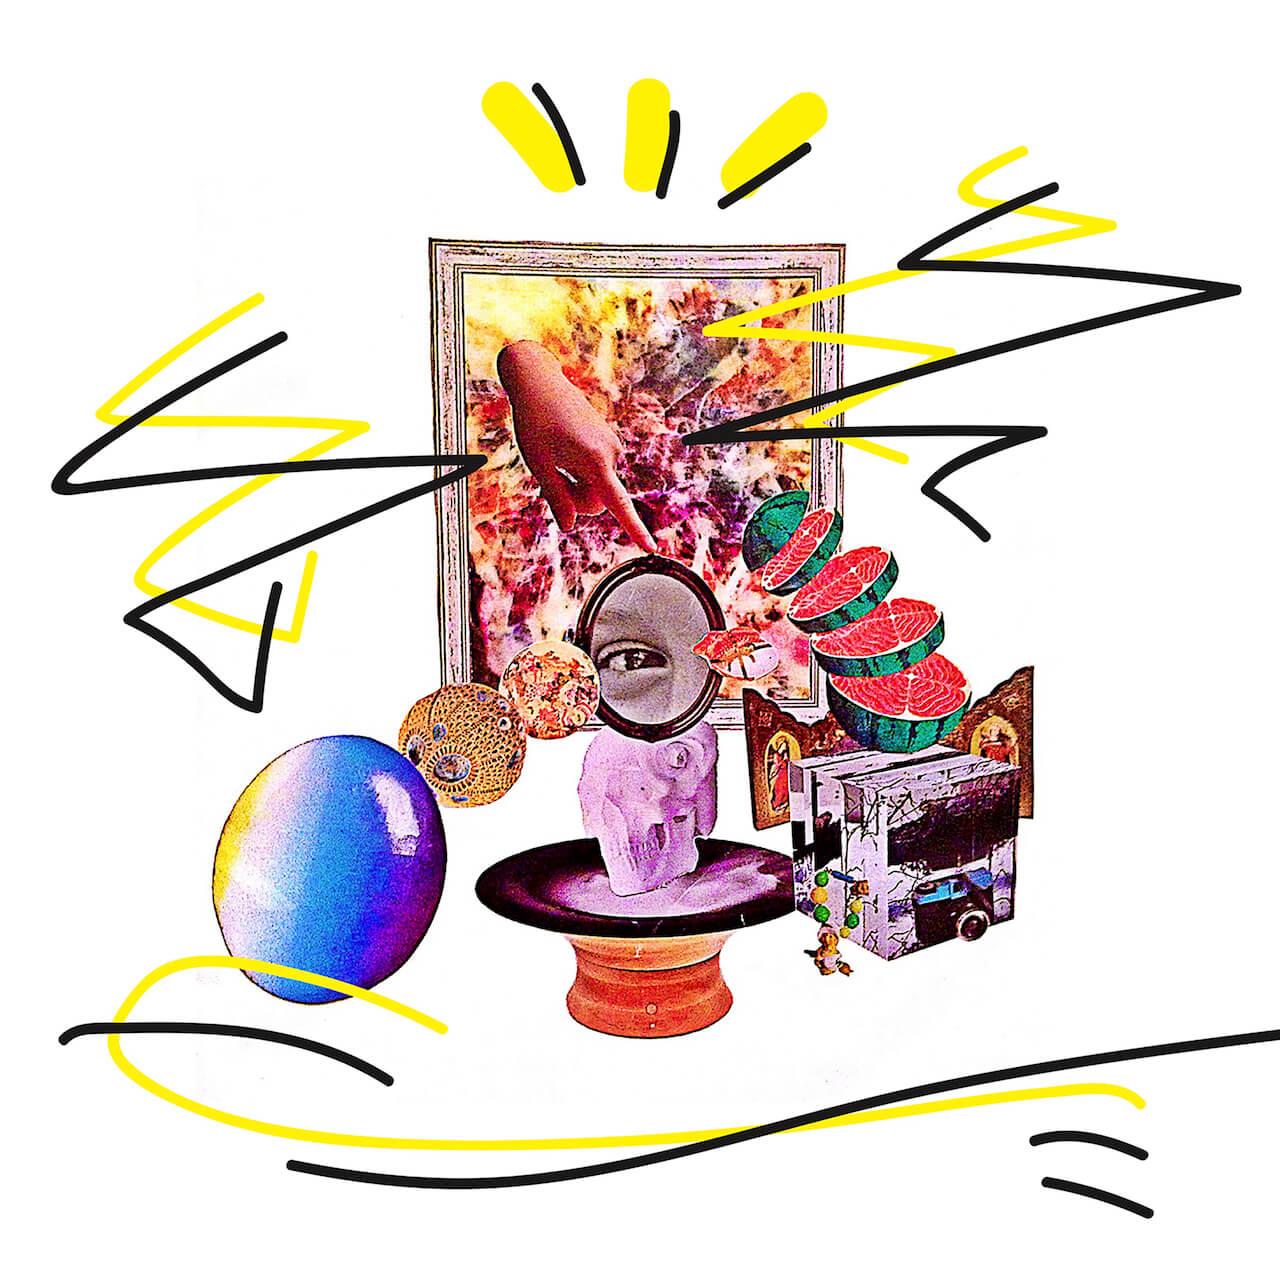 Aru-2によるフル・アルバム『Little Heaven』が6月にリリース|Campanella、KID FRESINOが客演する「Go Away」が本日から先行配信 music200429-aru2-2